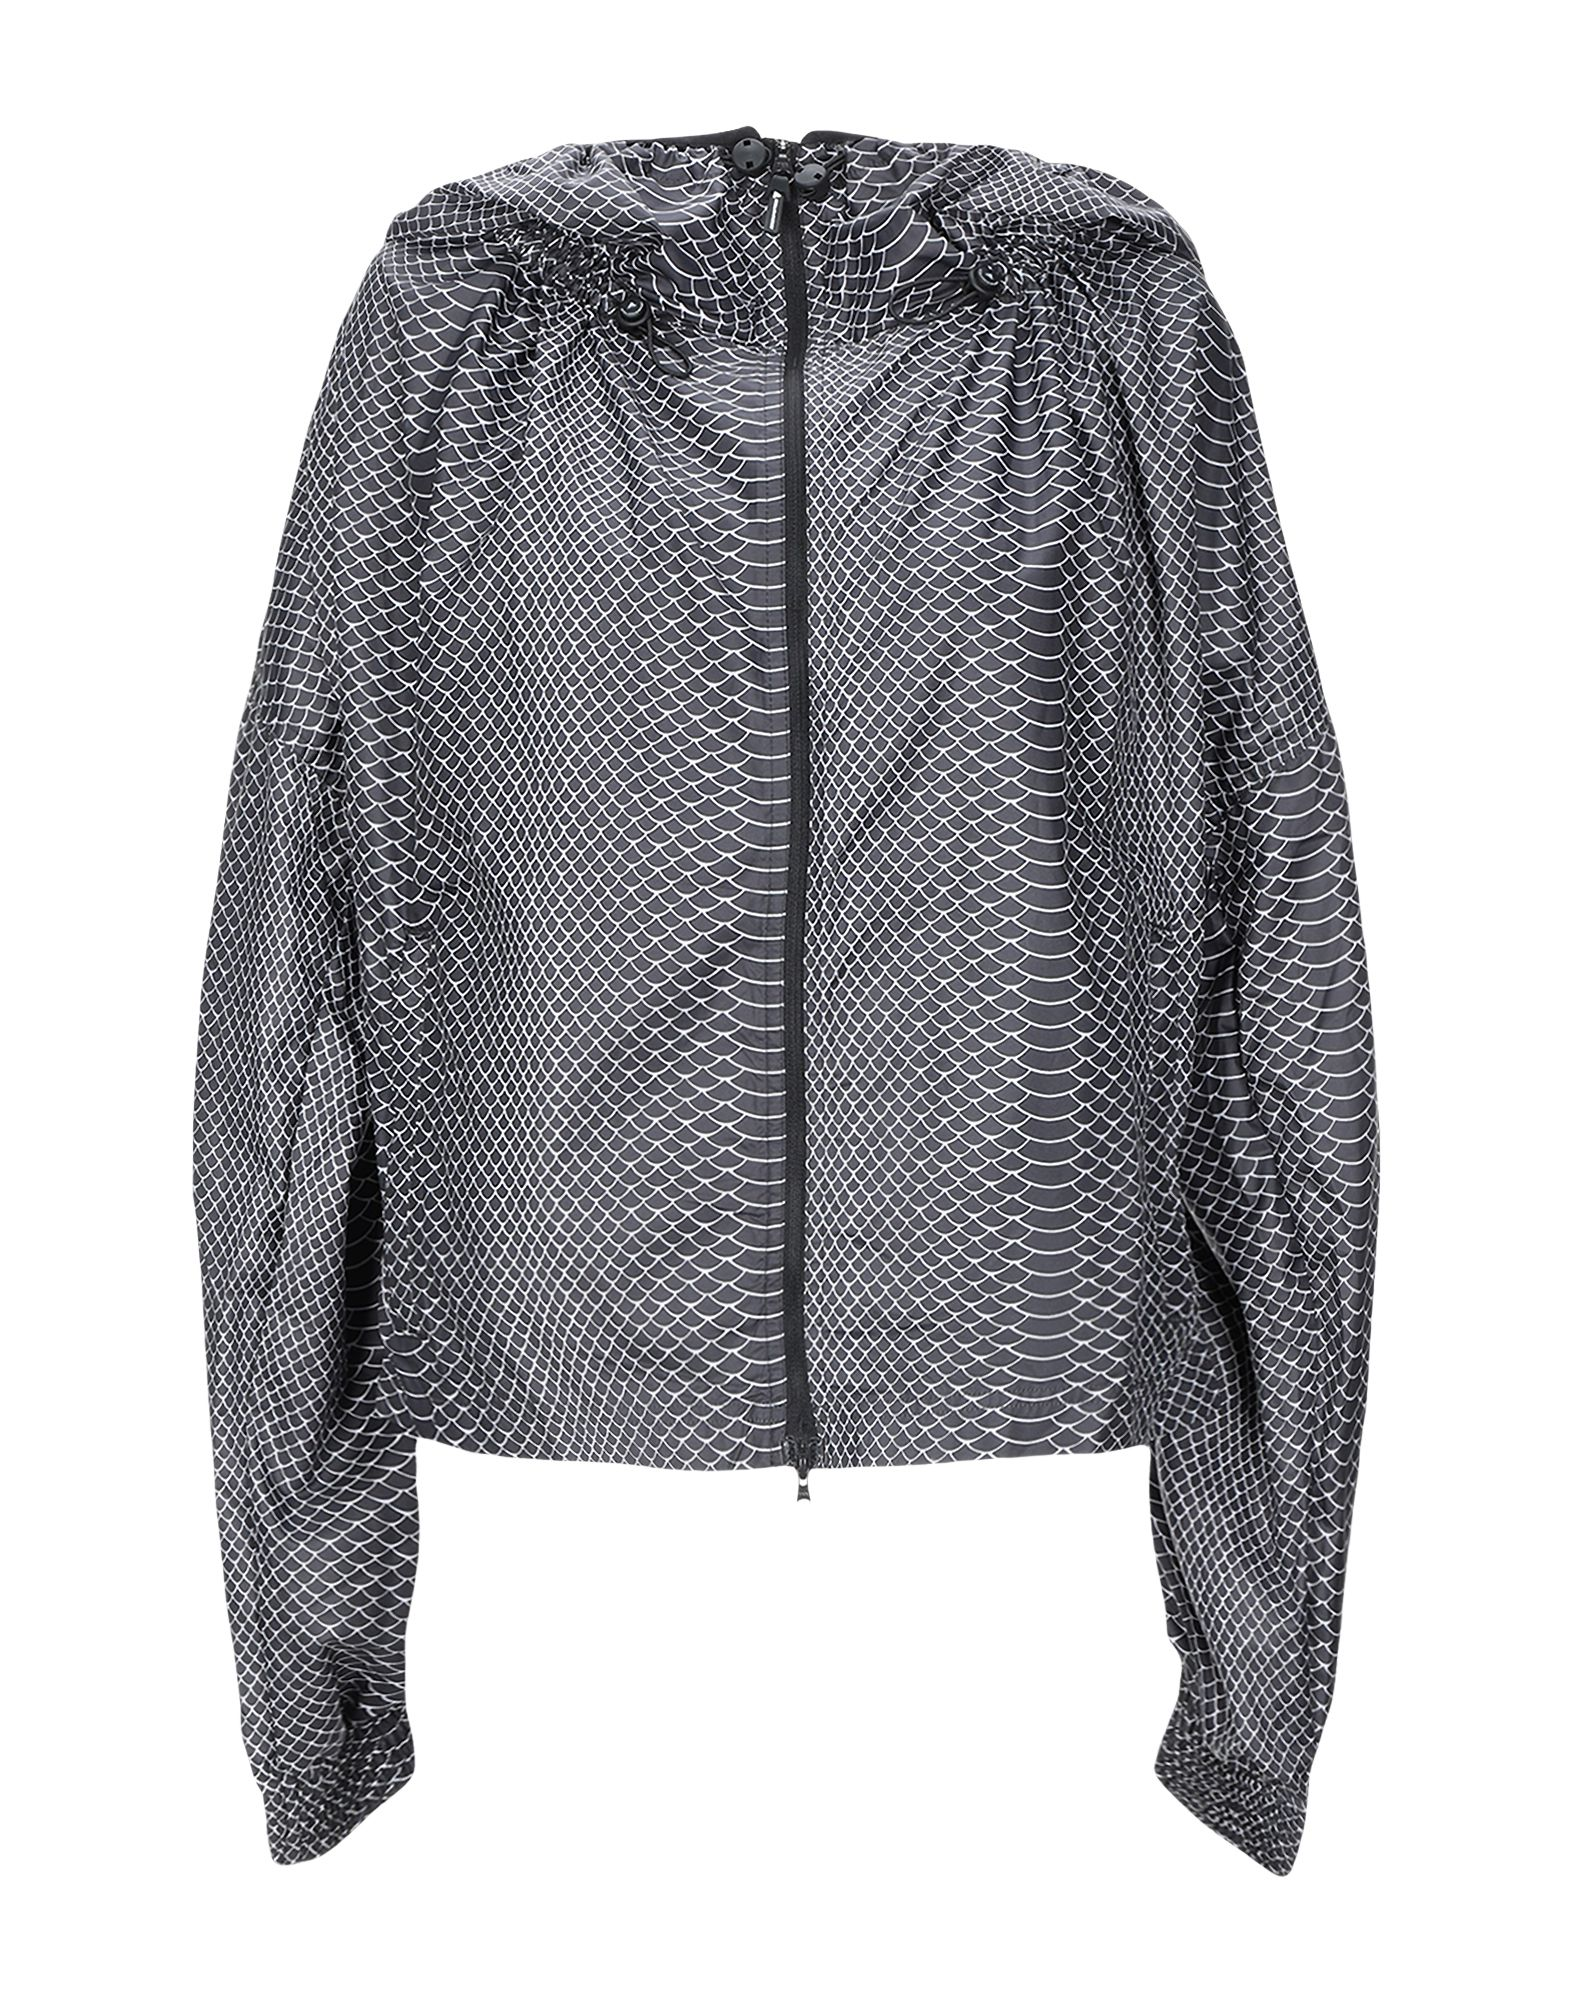 ADIDAS by STELLA McCARTNEY Куртка цена в Москве и Питере